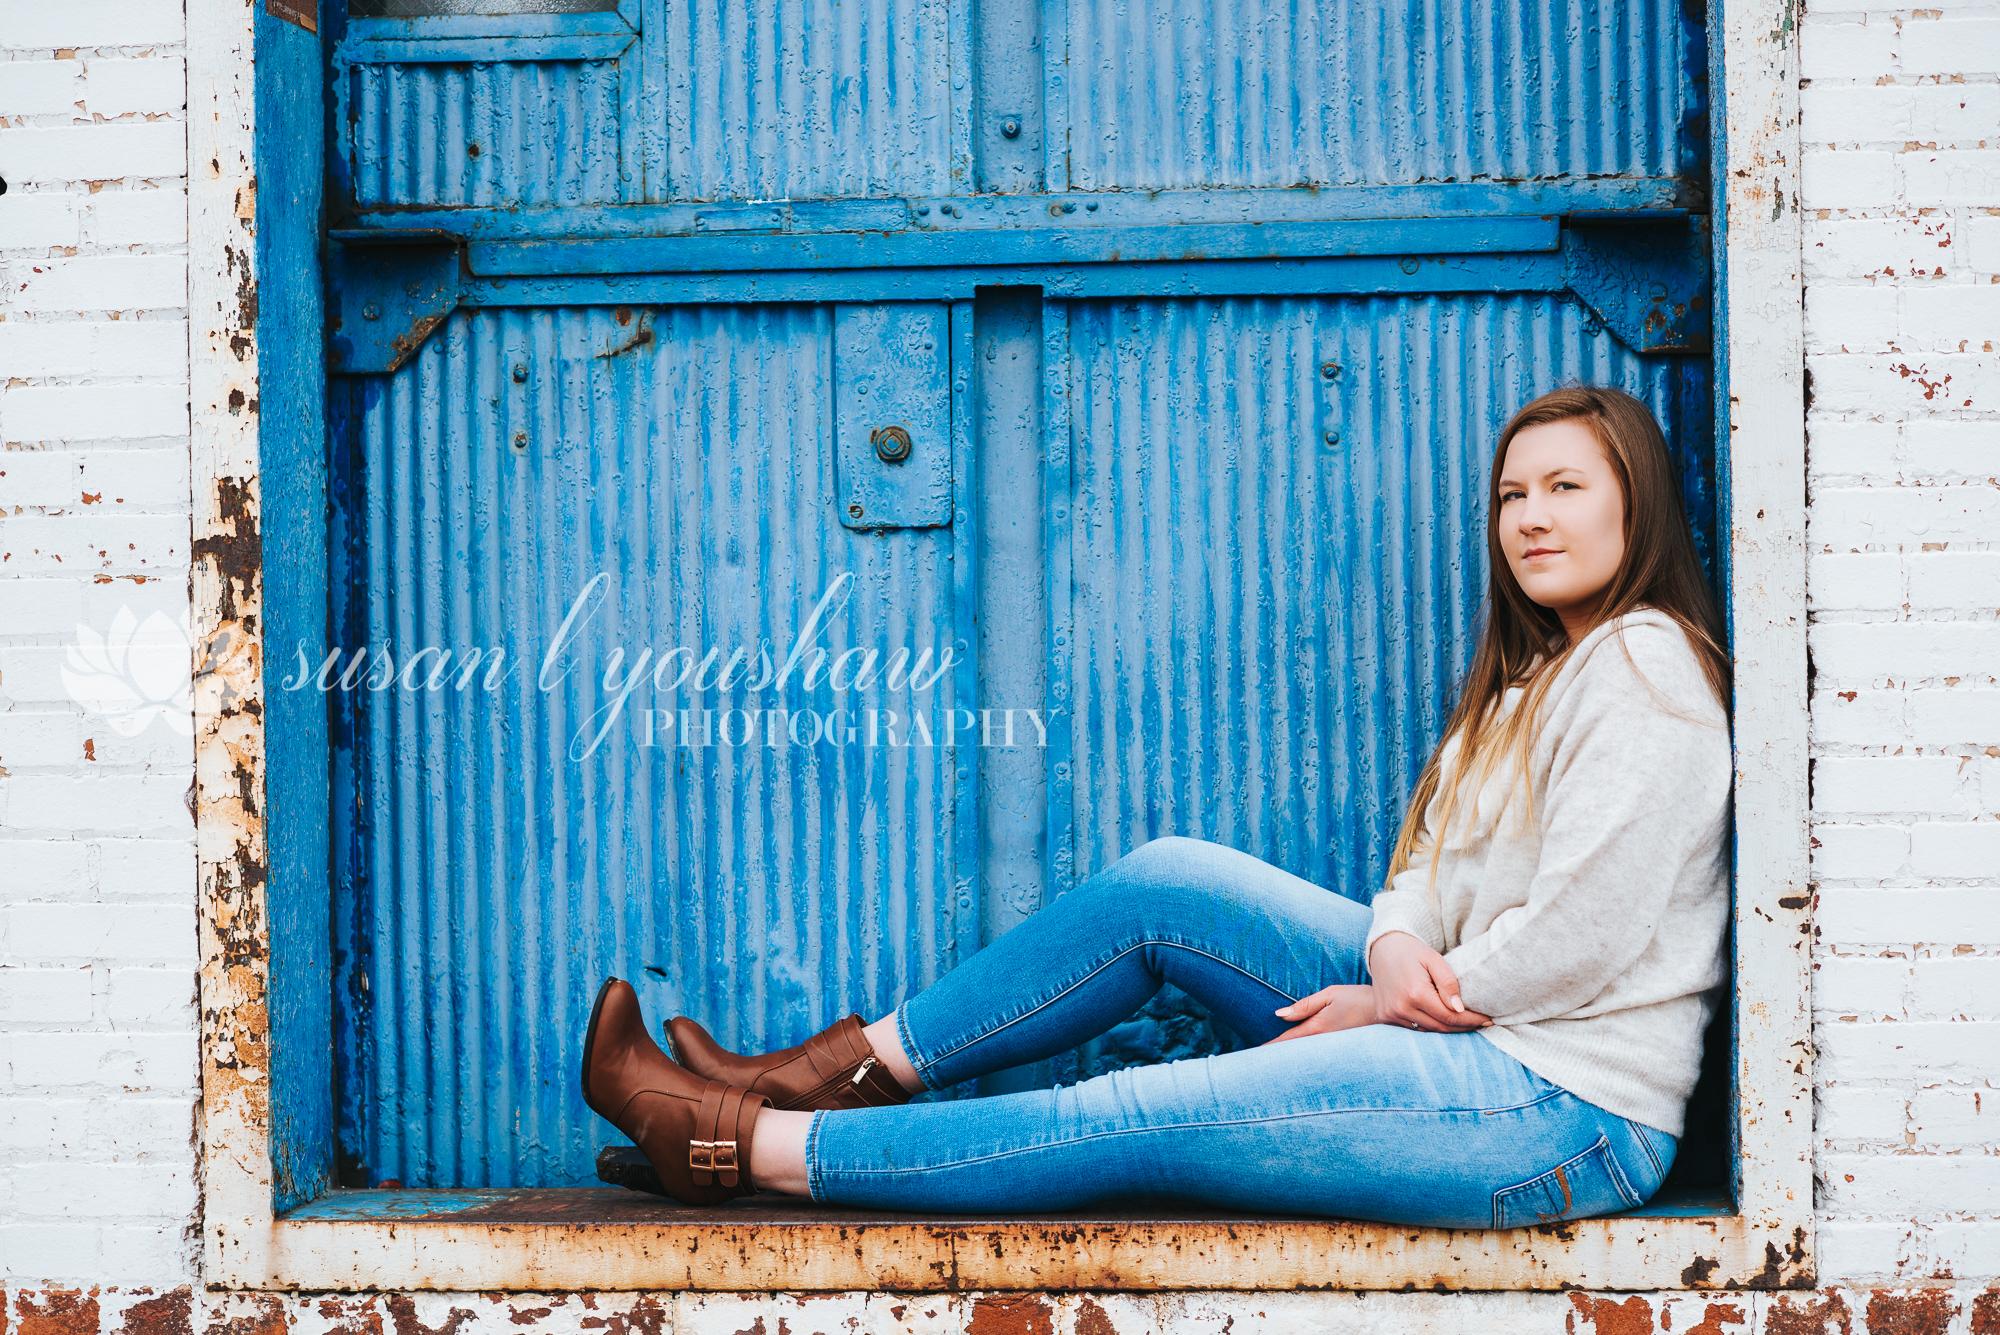 senior portraits allison 11-14-2018 sly photography-6.jpg